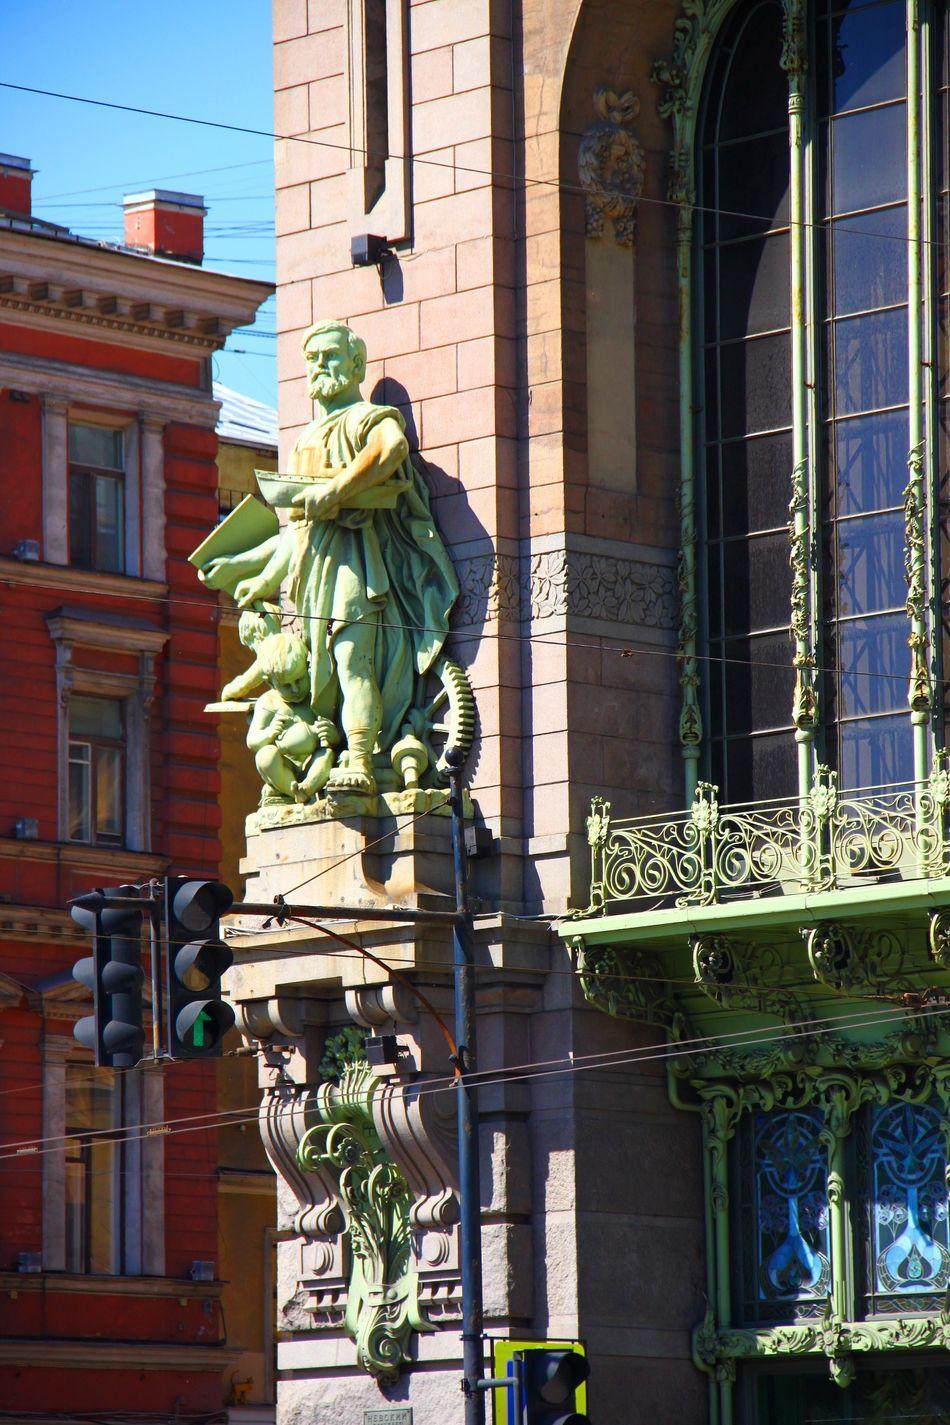 San Petersburg Façade Architecture Historical Building Russia Russia, St.Petersburg Food Hall Art Nouveau Allegorical Sculpture Nevsky Prospect Founded 1903